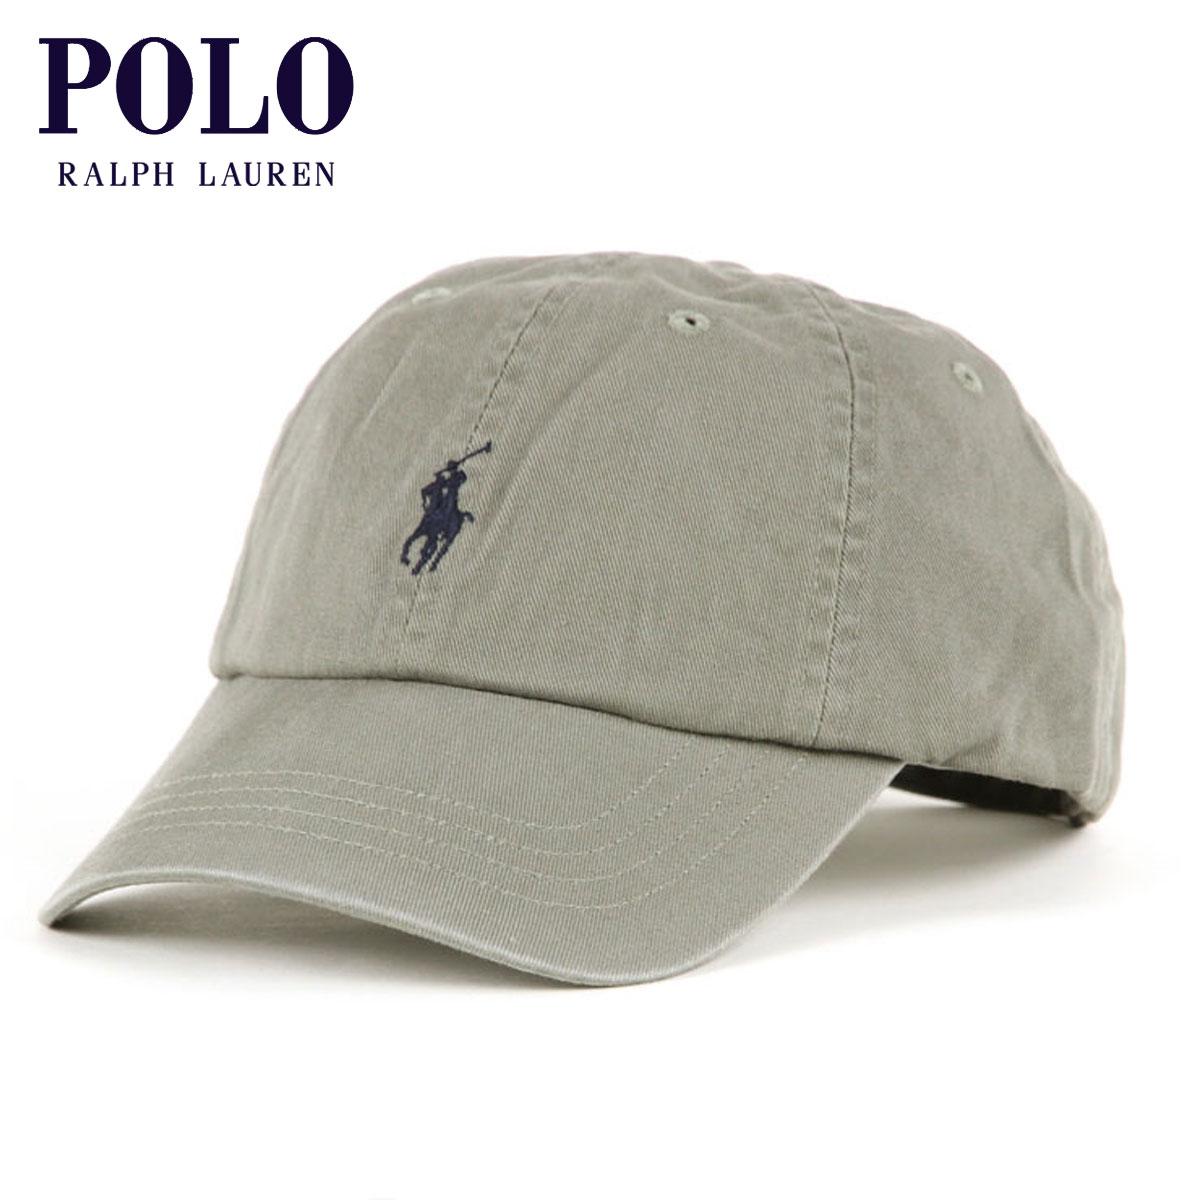 2d8176b9cc81 Polo Ralph Lauren POLO RALPH LAUREN genuine men s hats Cap COTTON CHINO  BASEBALL CAP